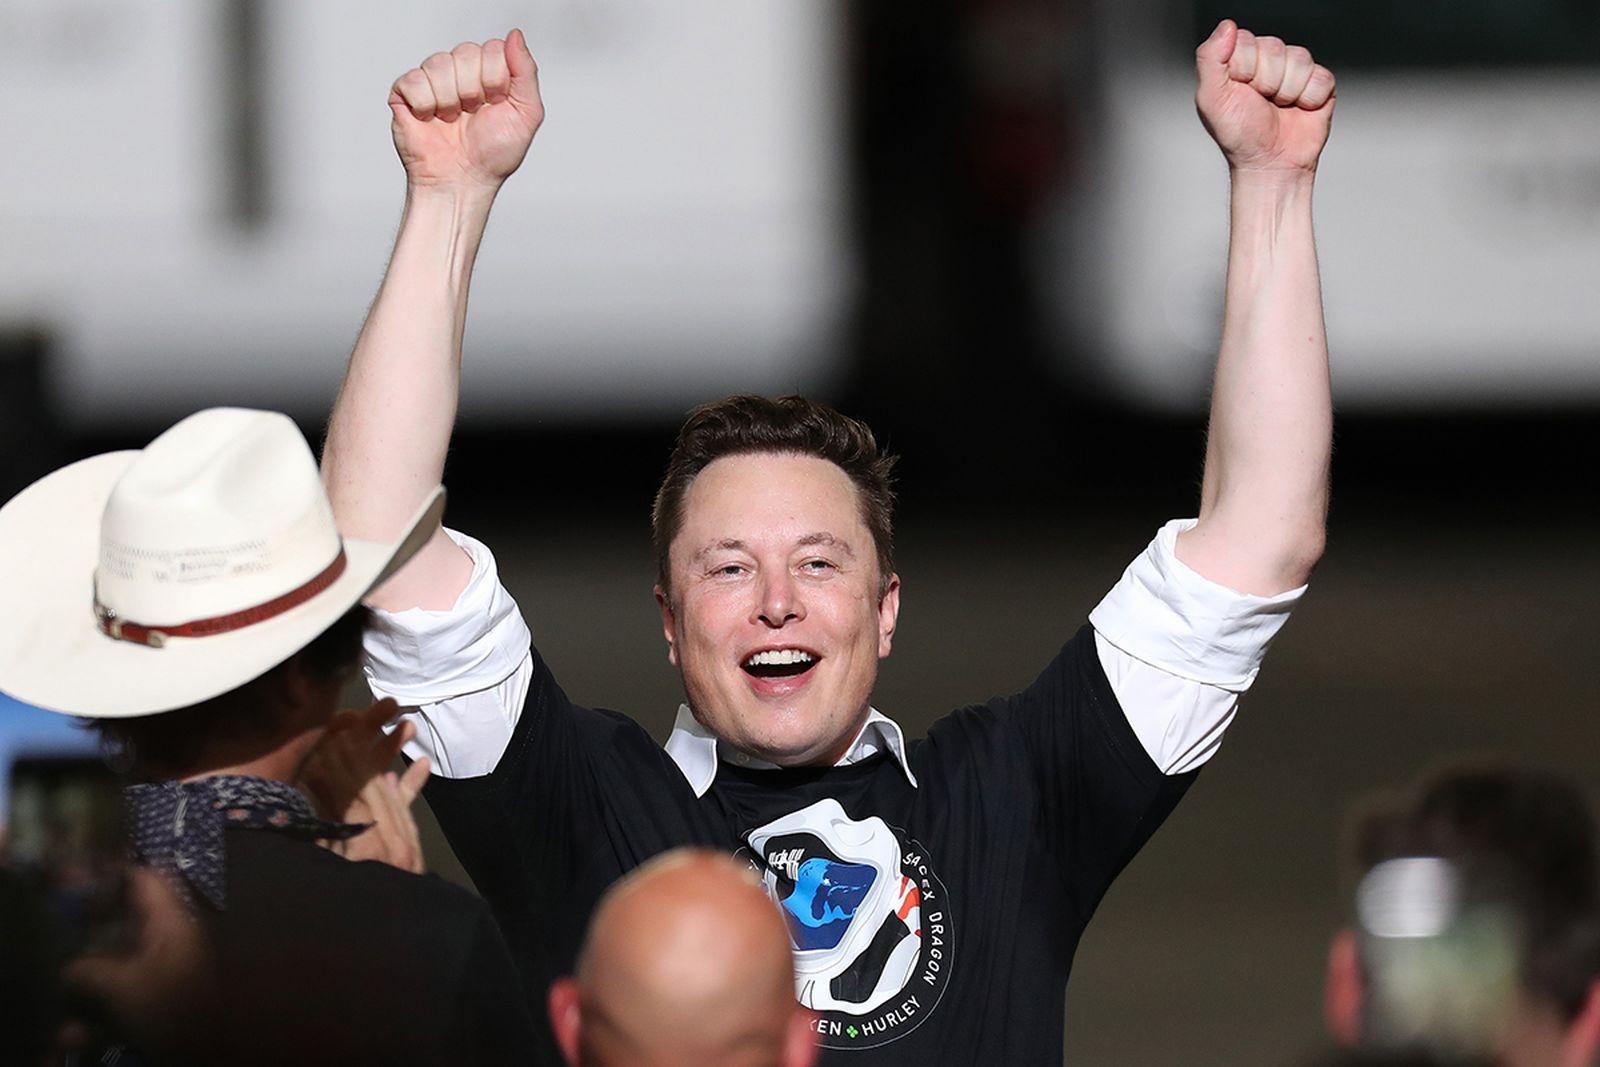 Elon Musk smiling